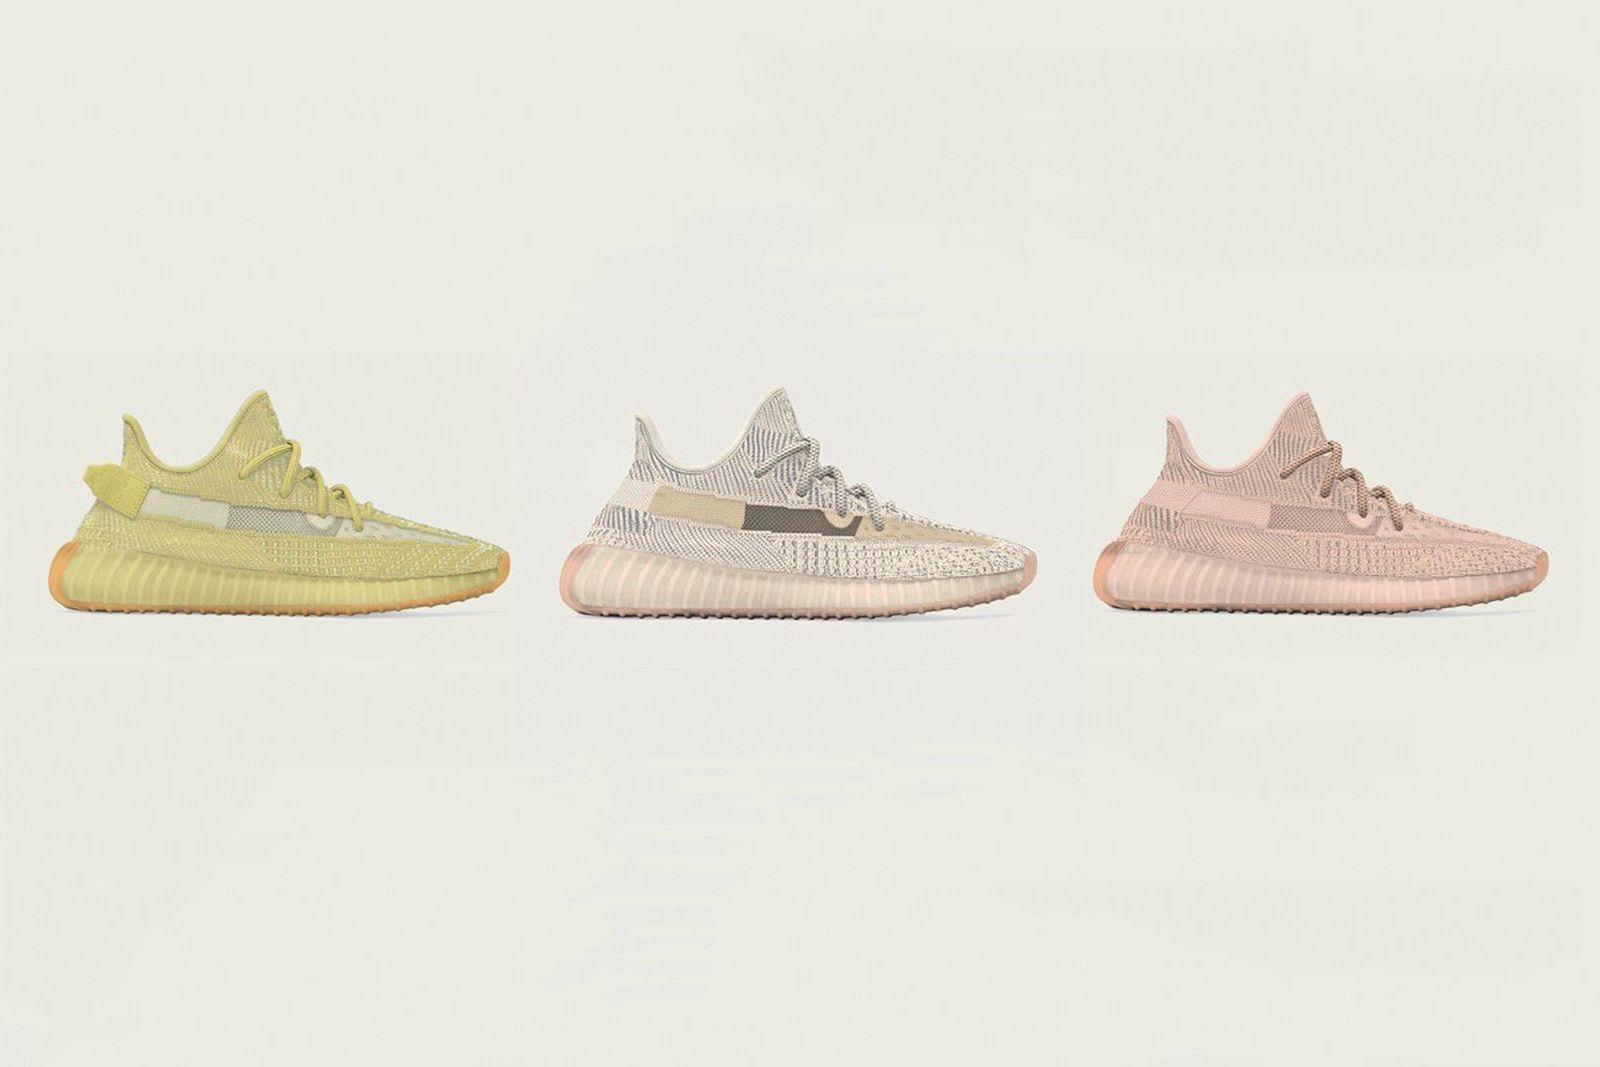 yeezy boost 350 v2 antlia lundmark synth release date price StockX adidas yeezy boost 350 v2 kanye west